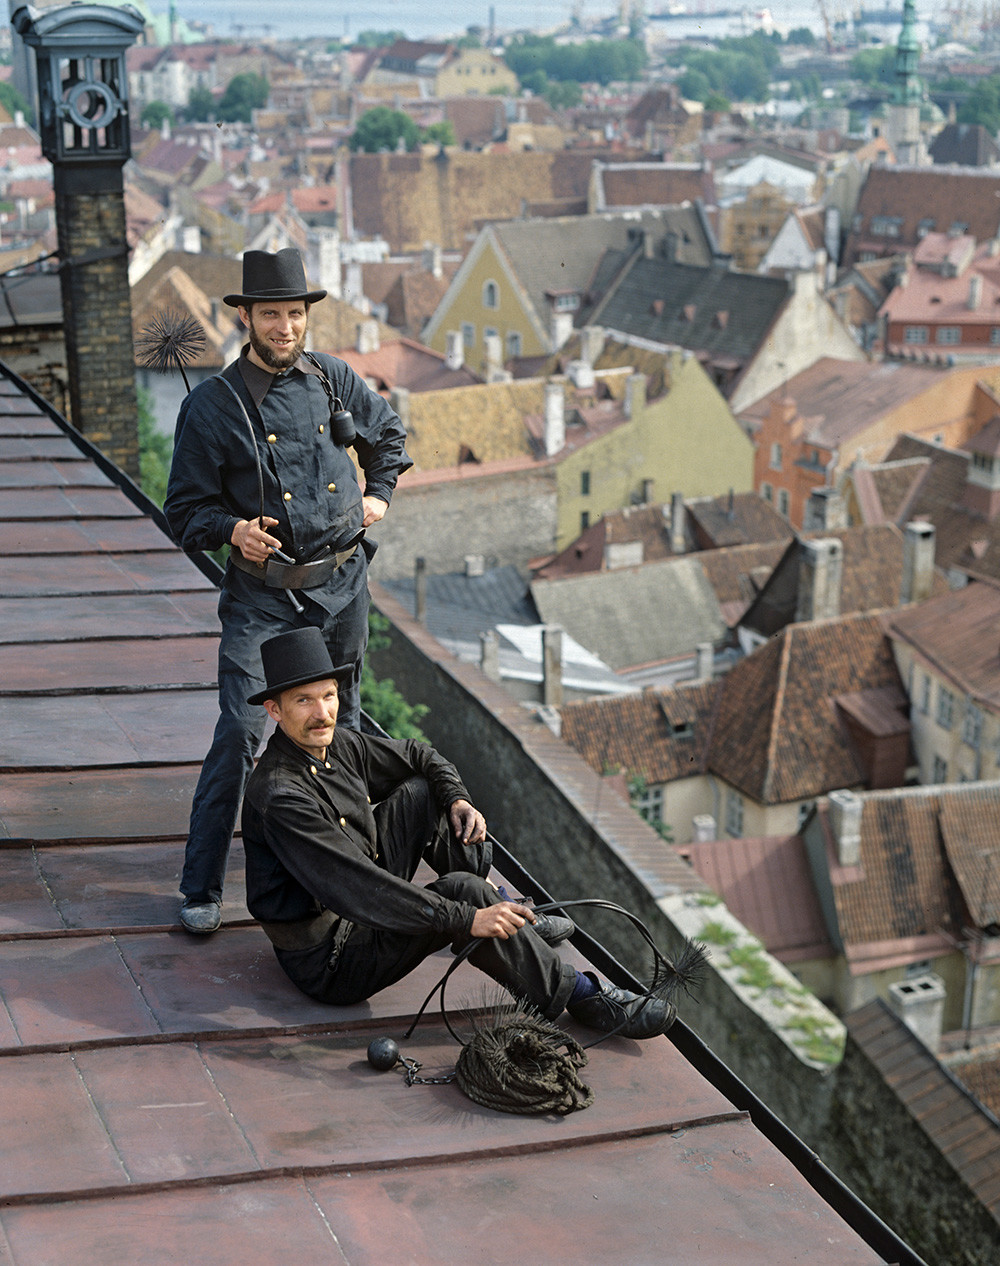 Oџачари на крову зграде.